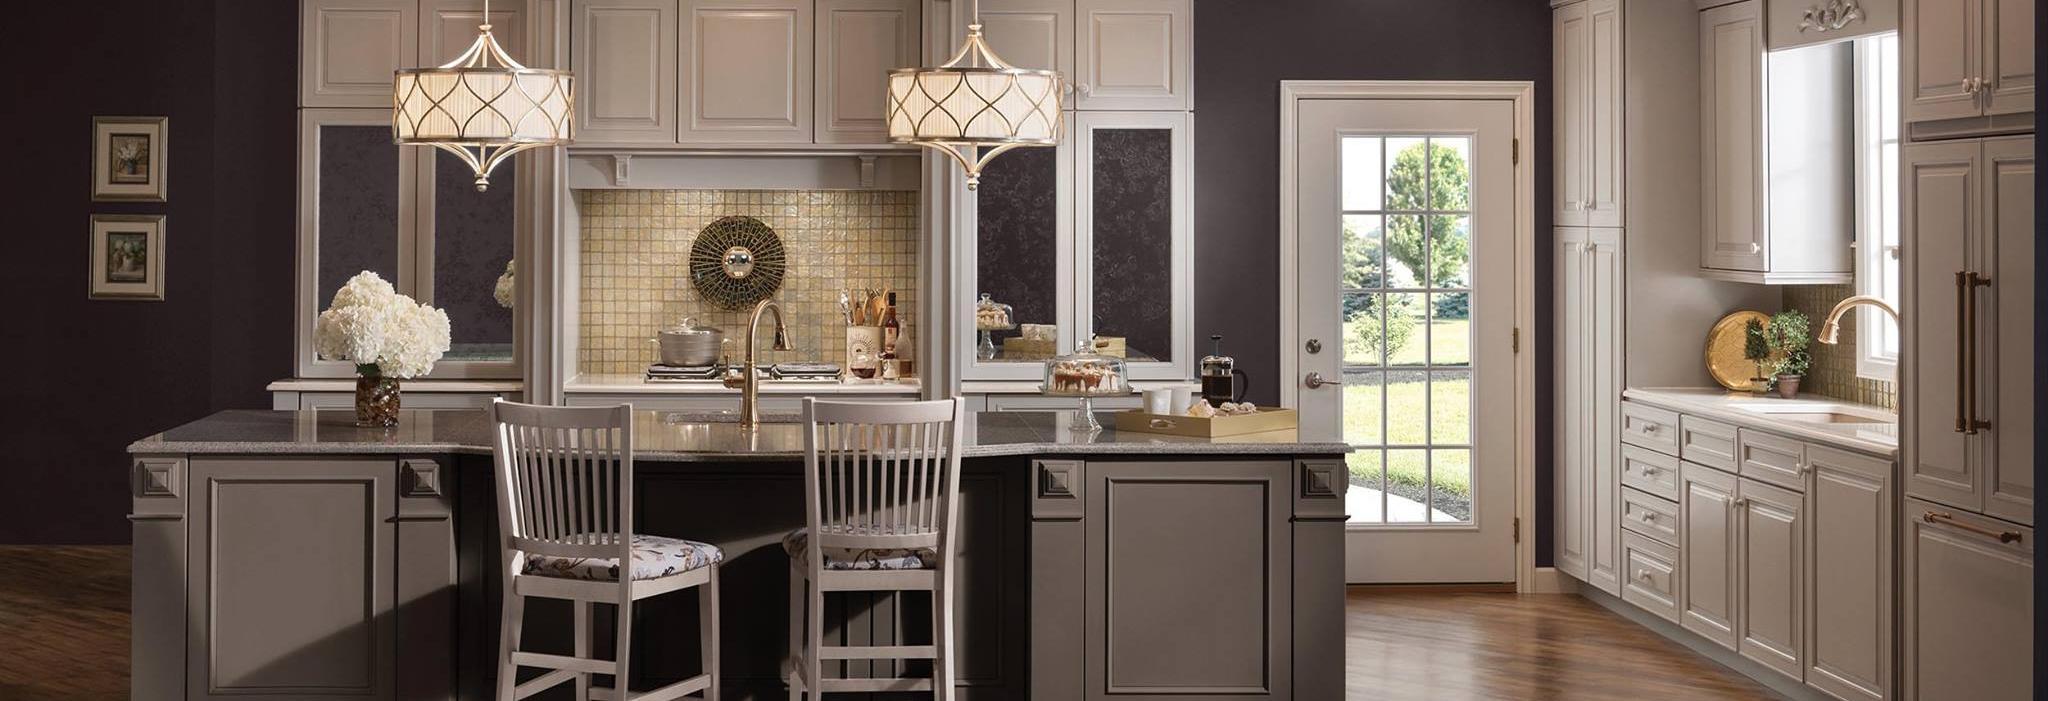 Best Kitchen Cabinet Coupons Cheap Kitchen Remodel Deals